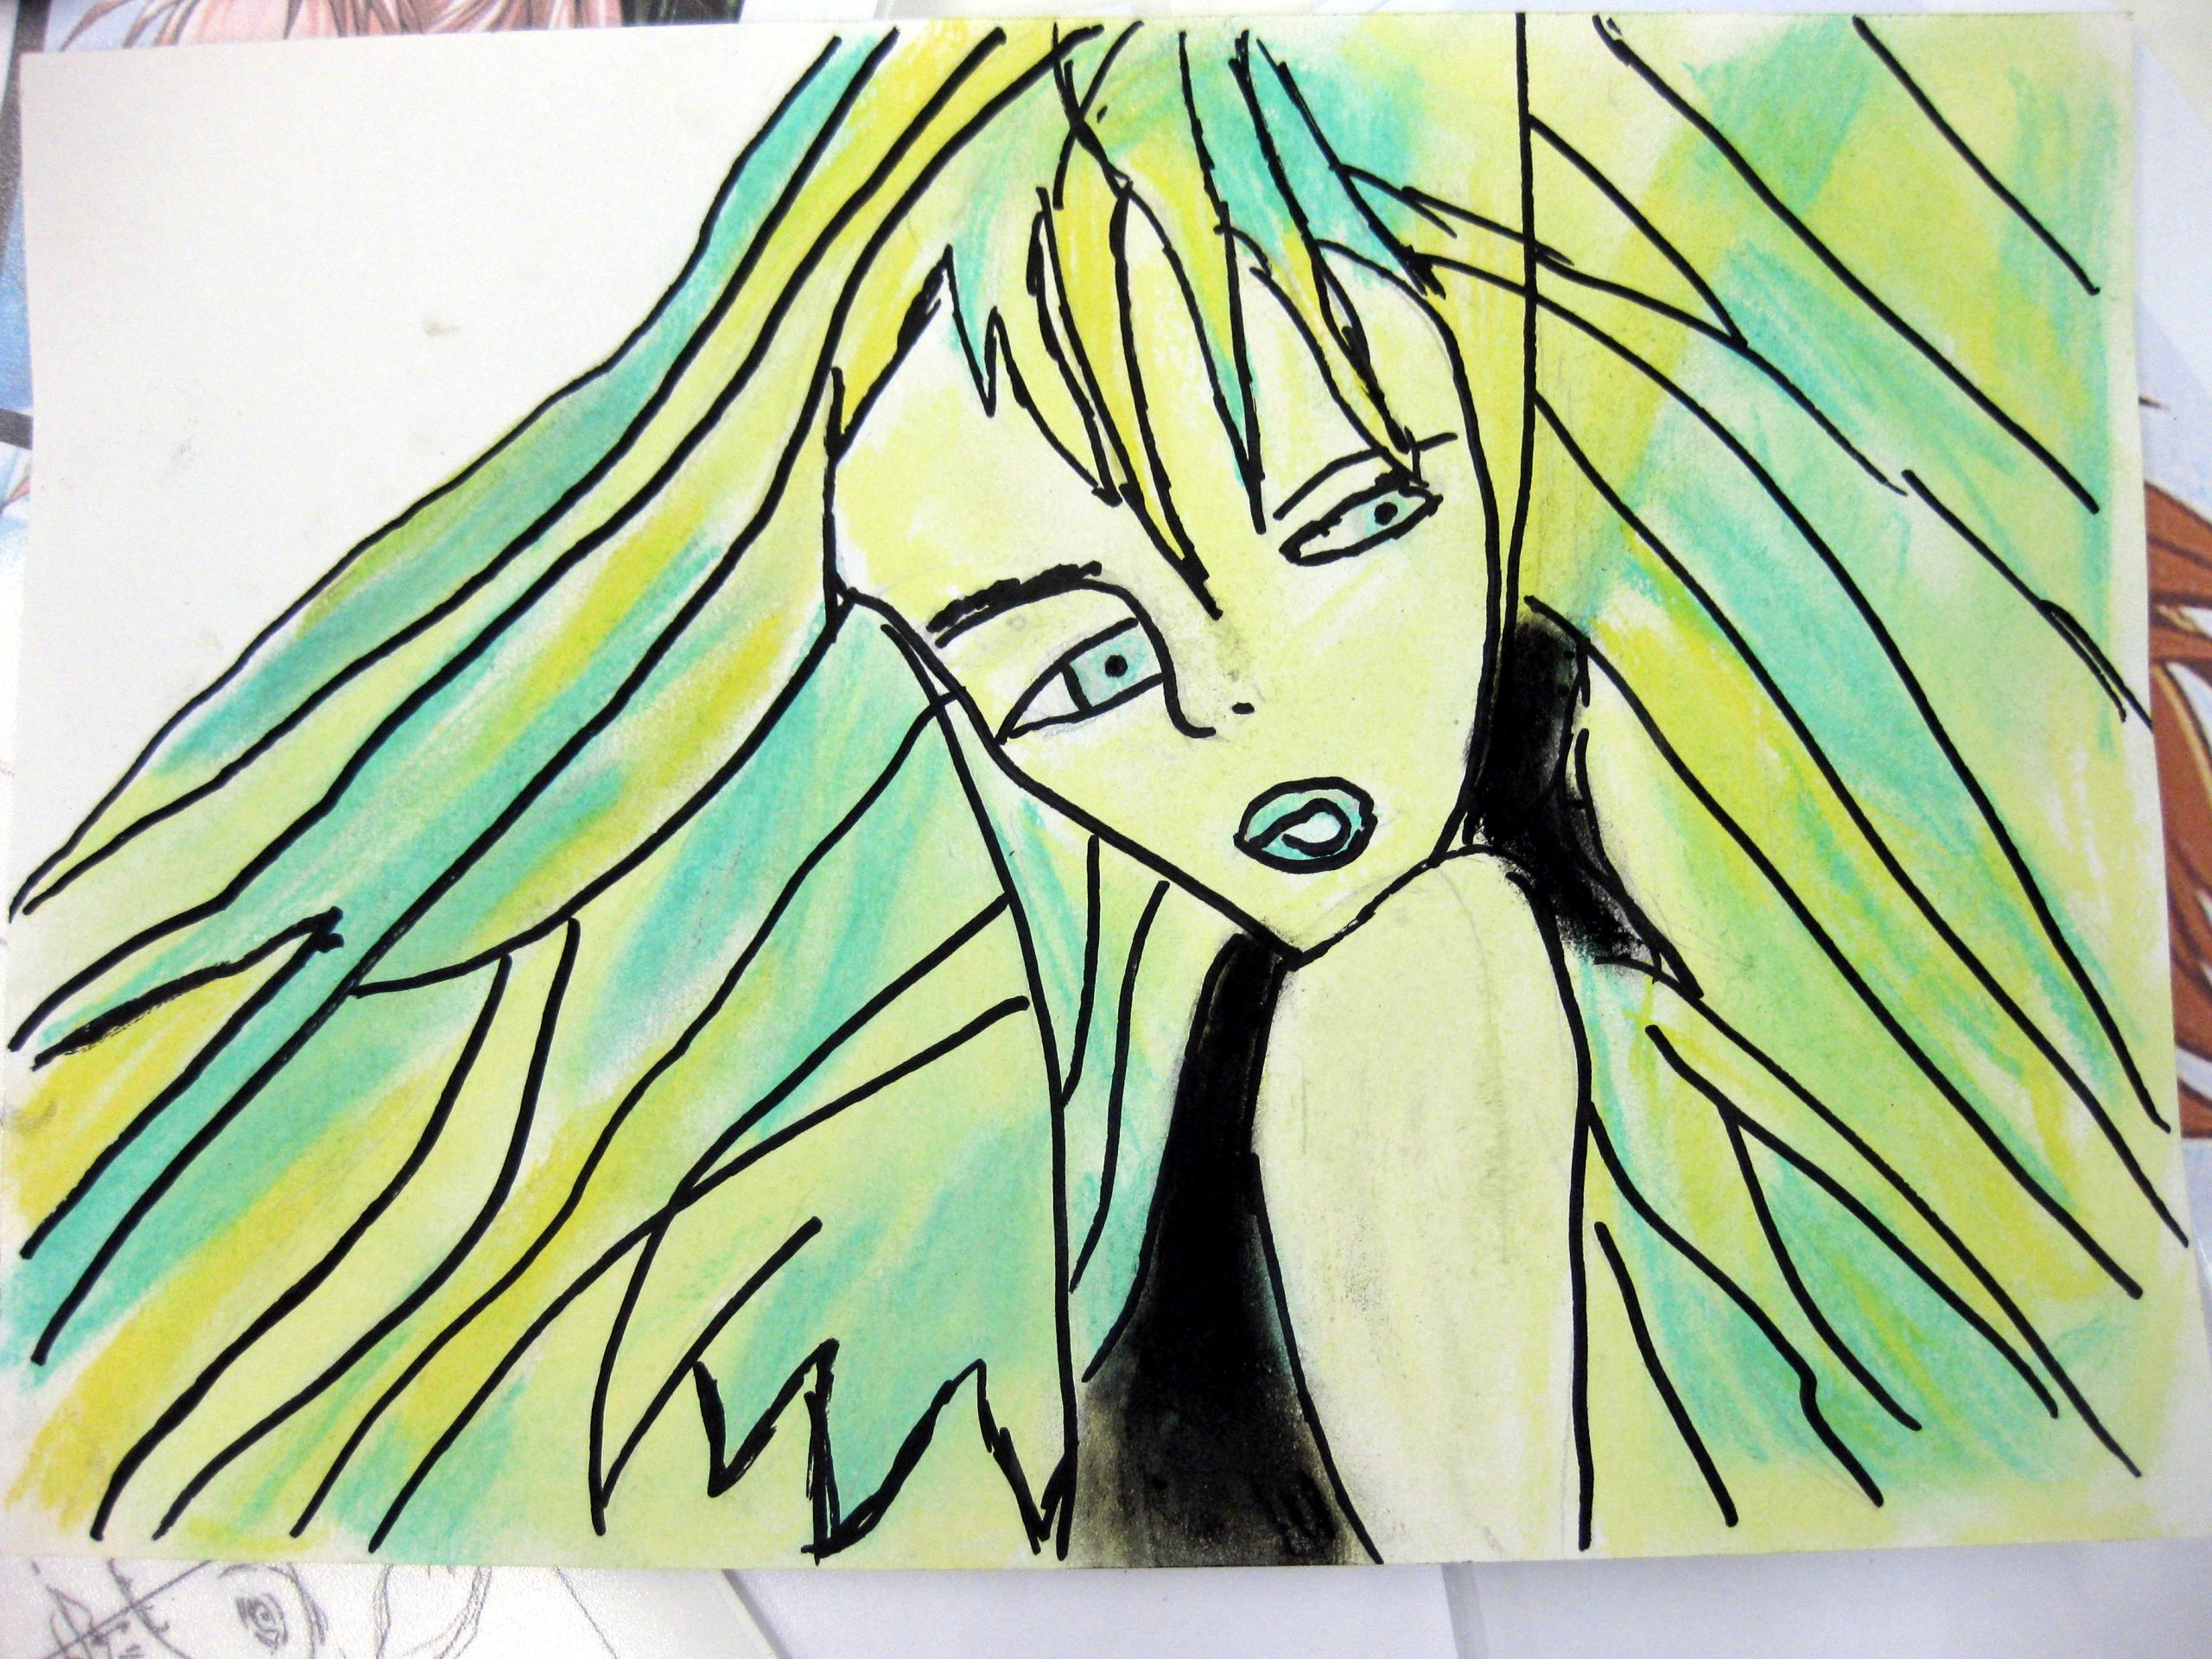 Manga mit grünen Haaren